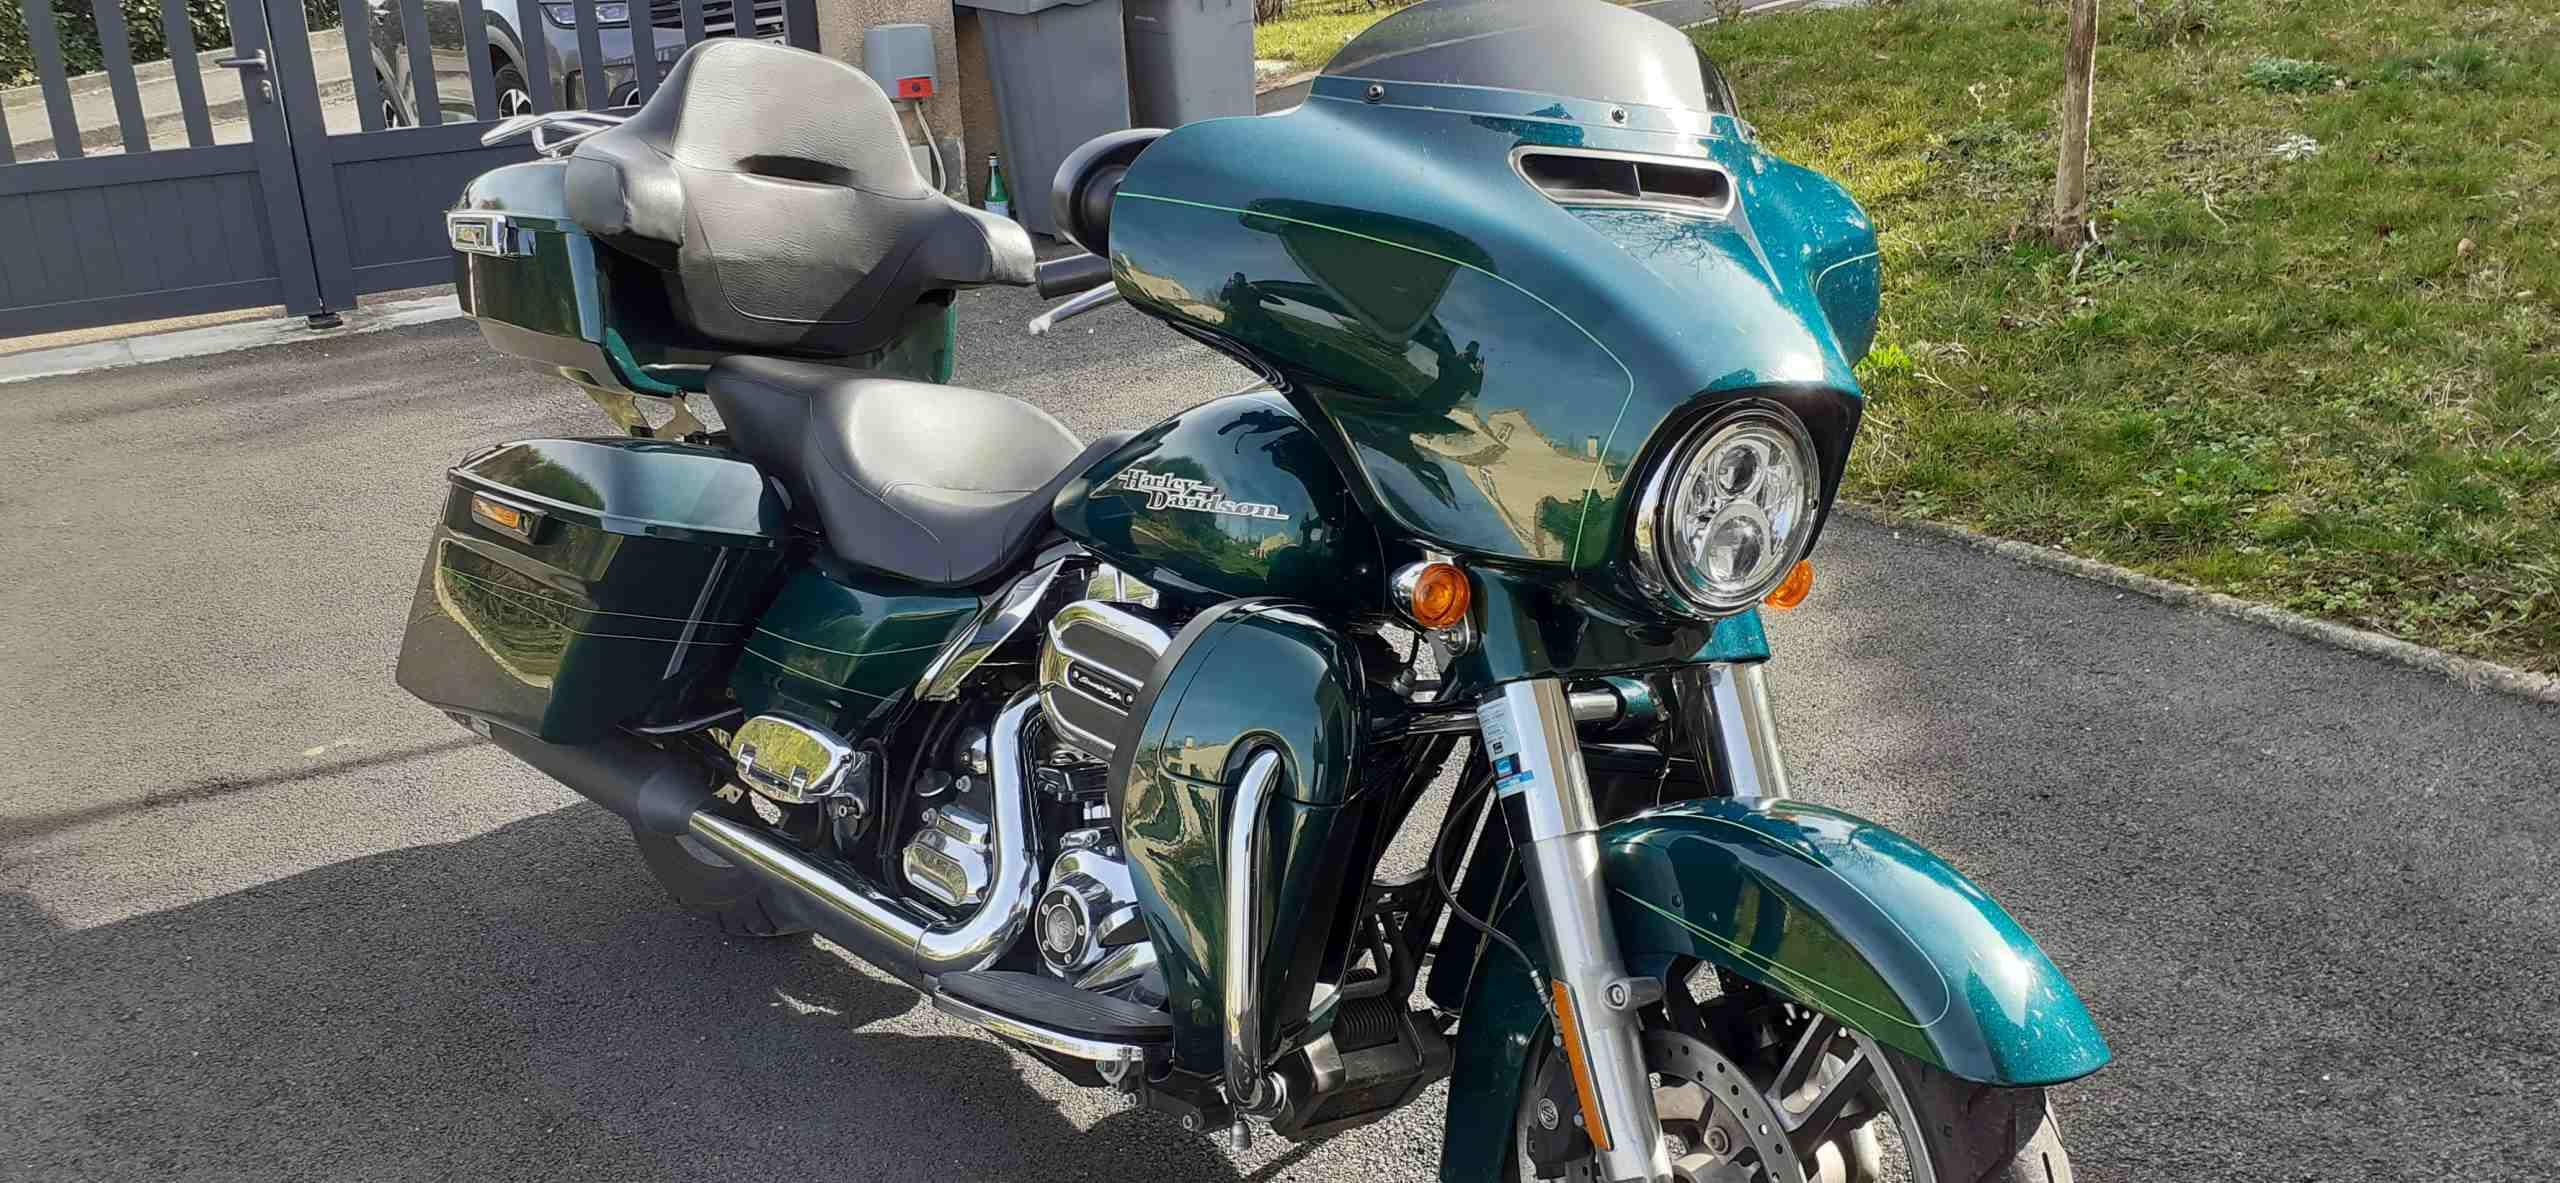 Harley Davidson Street glide special 2015. (FLHXS)